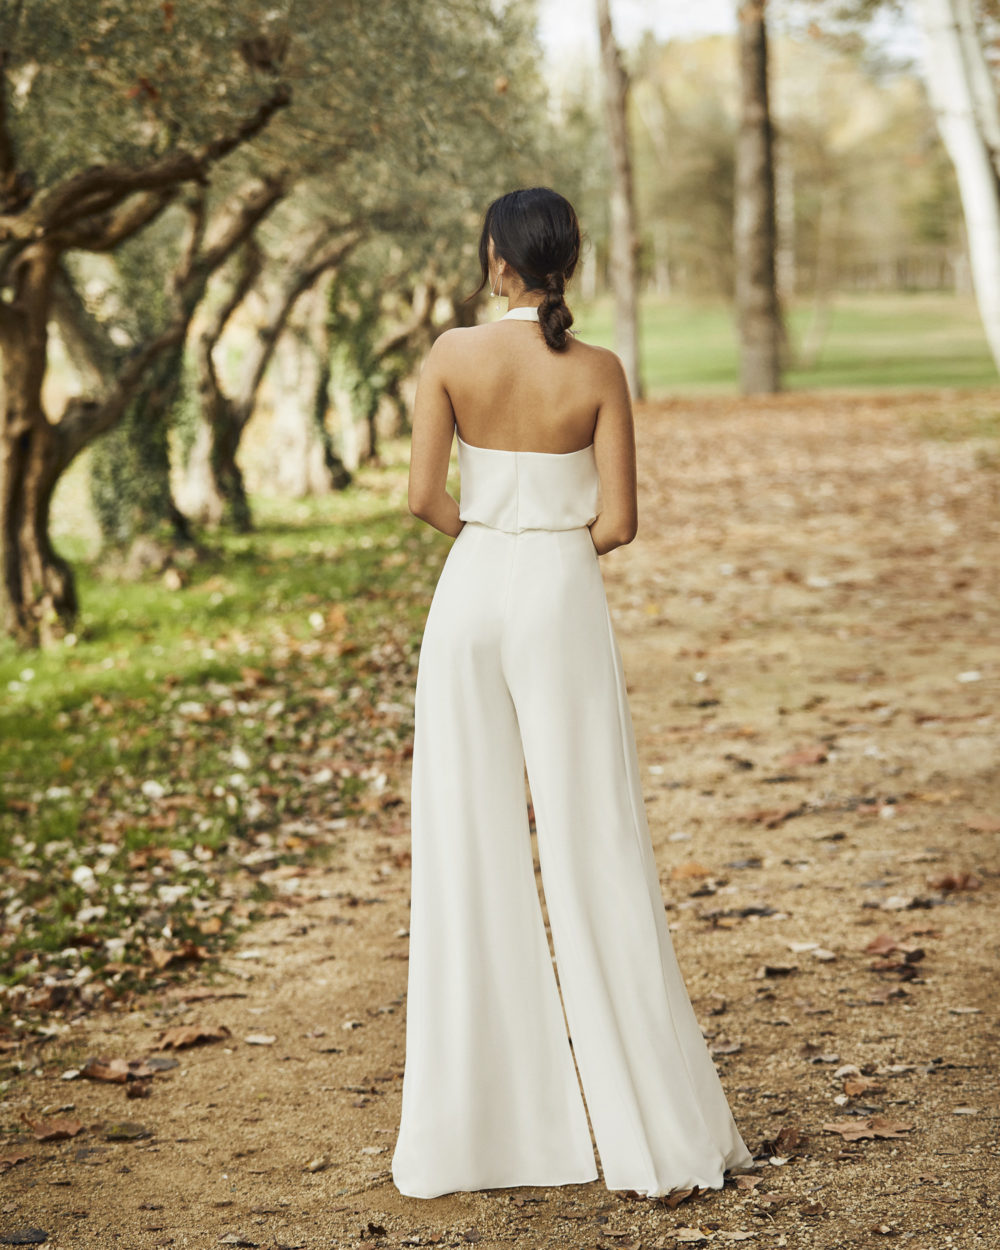 Mariages: abito da sposa Rosa Clarà 2020 a Vicenza, Verona, Padova, Veneto 4B101 OASIS